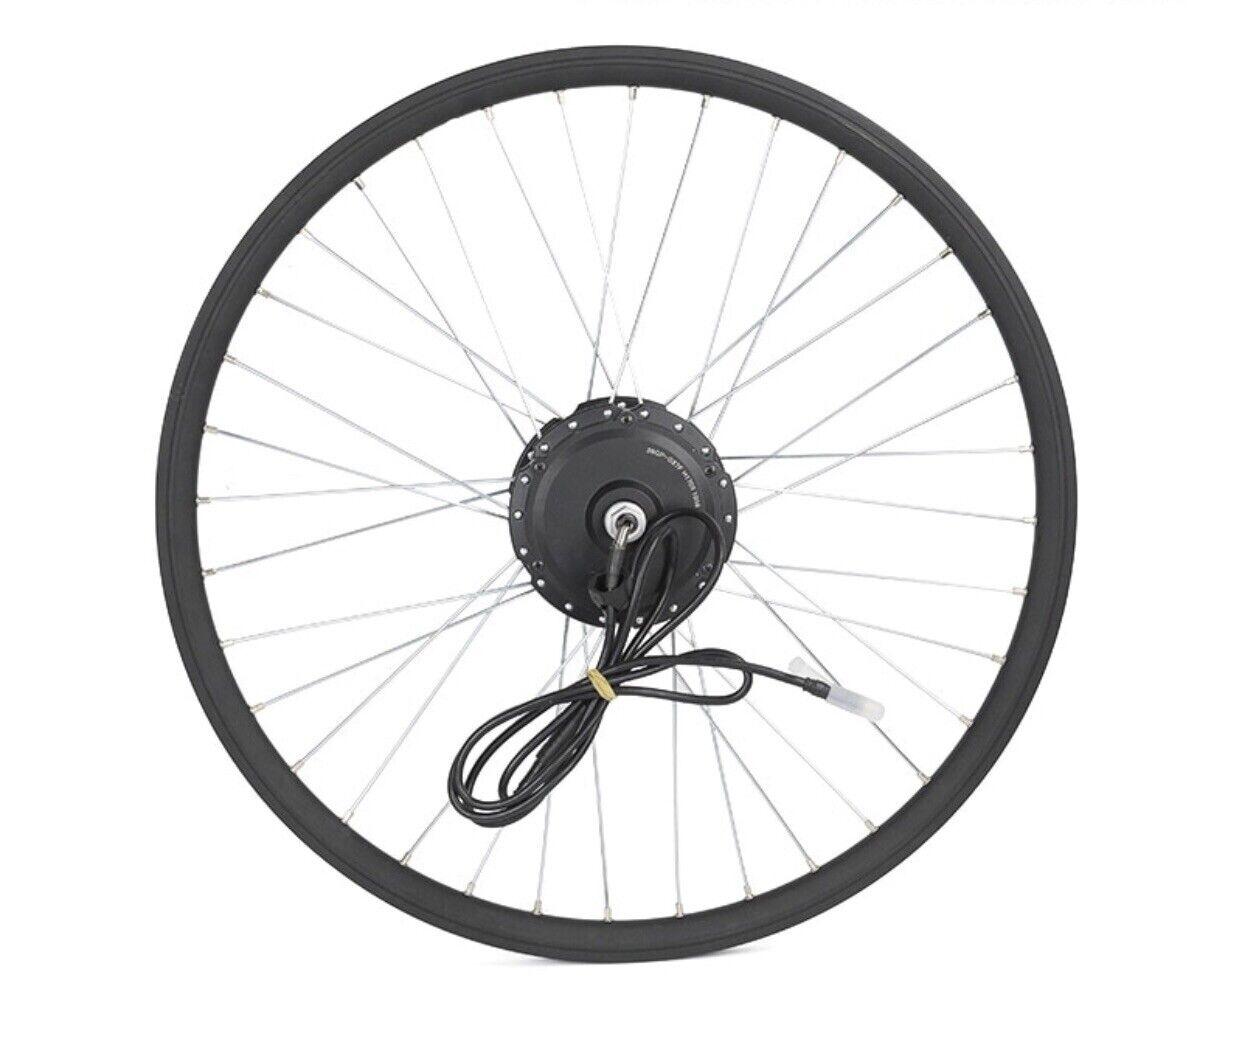 Motor de bicicleta eléctrica 250w 20 pulgadas rueda